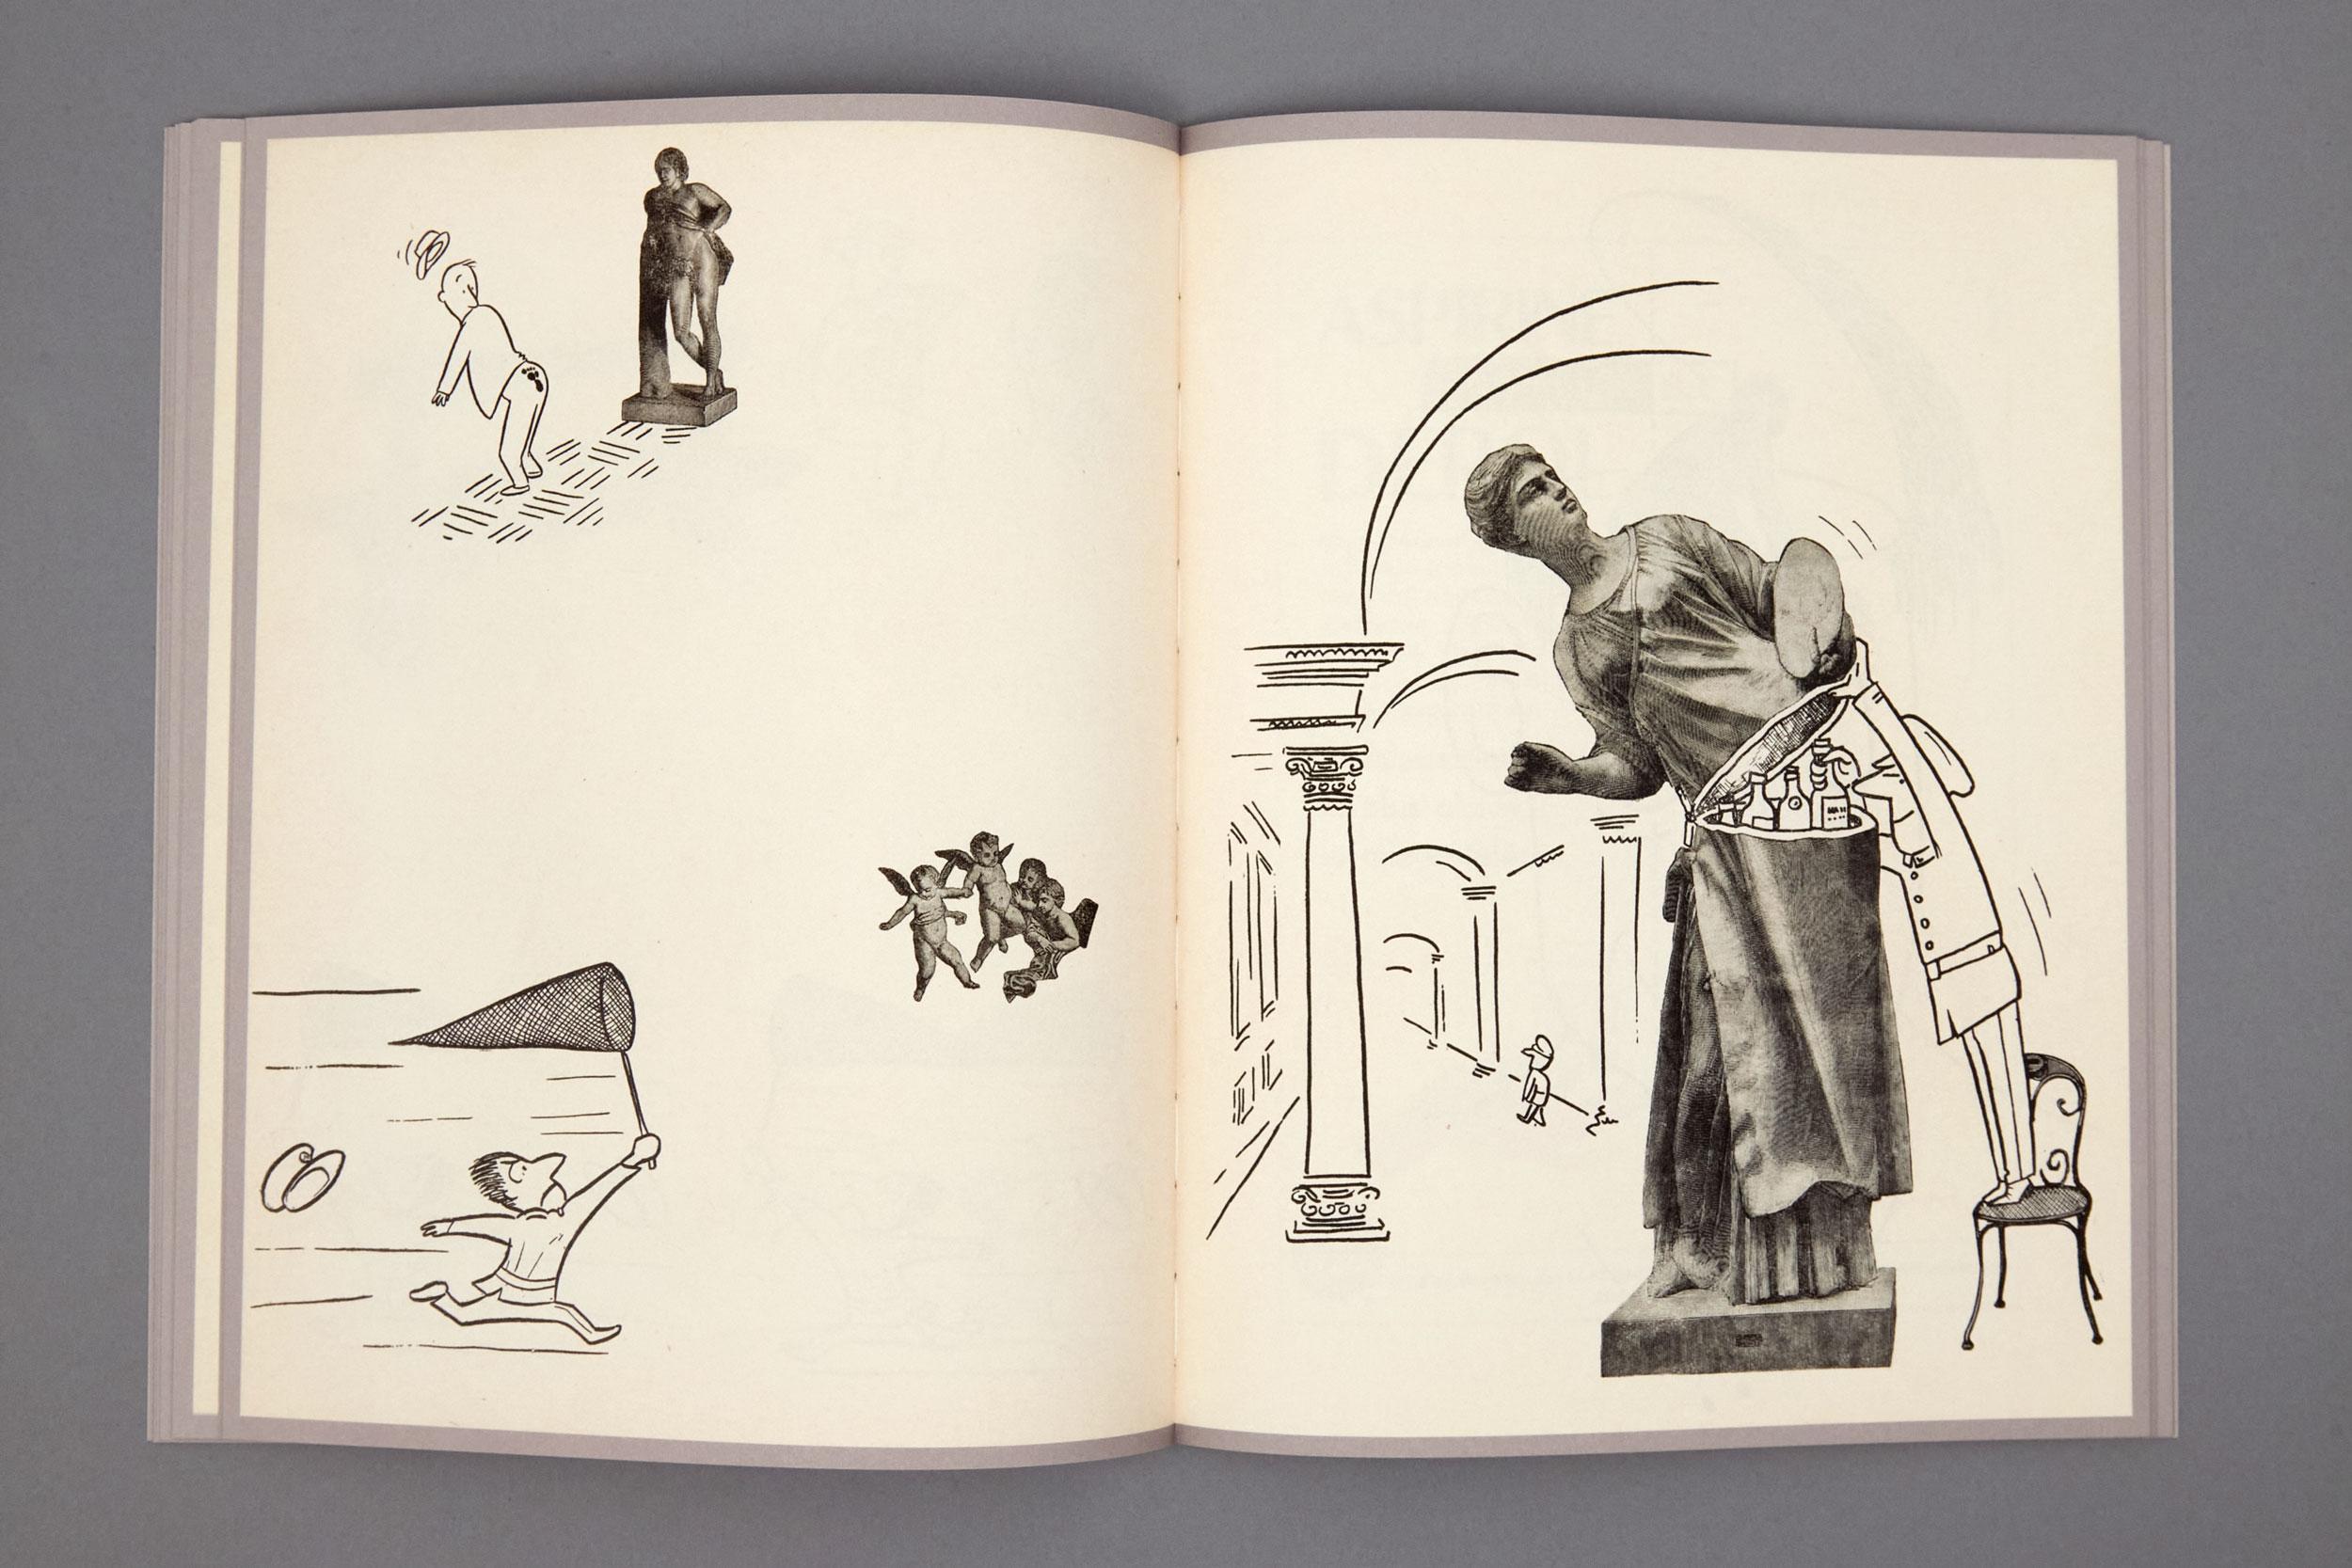 neuf-9-delpire-dessins-trez